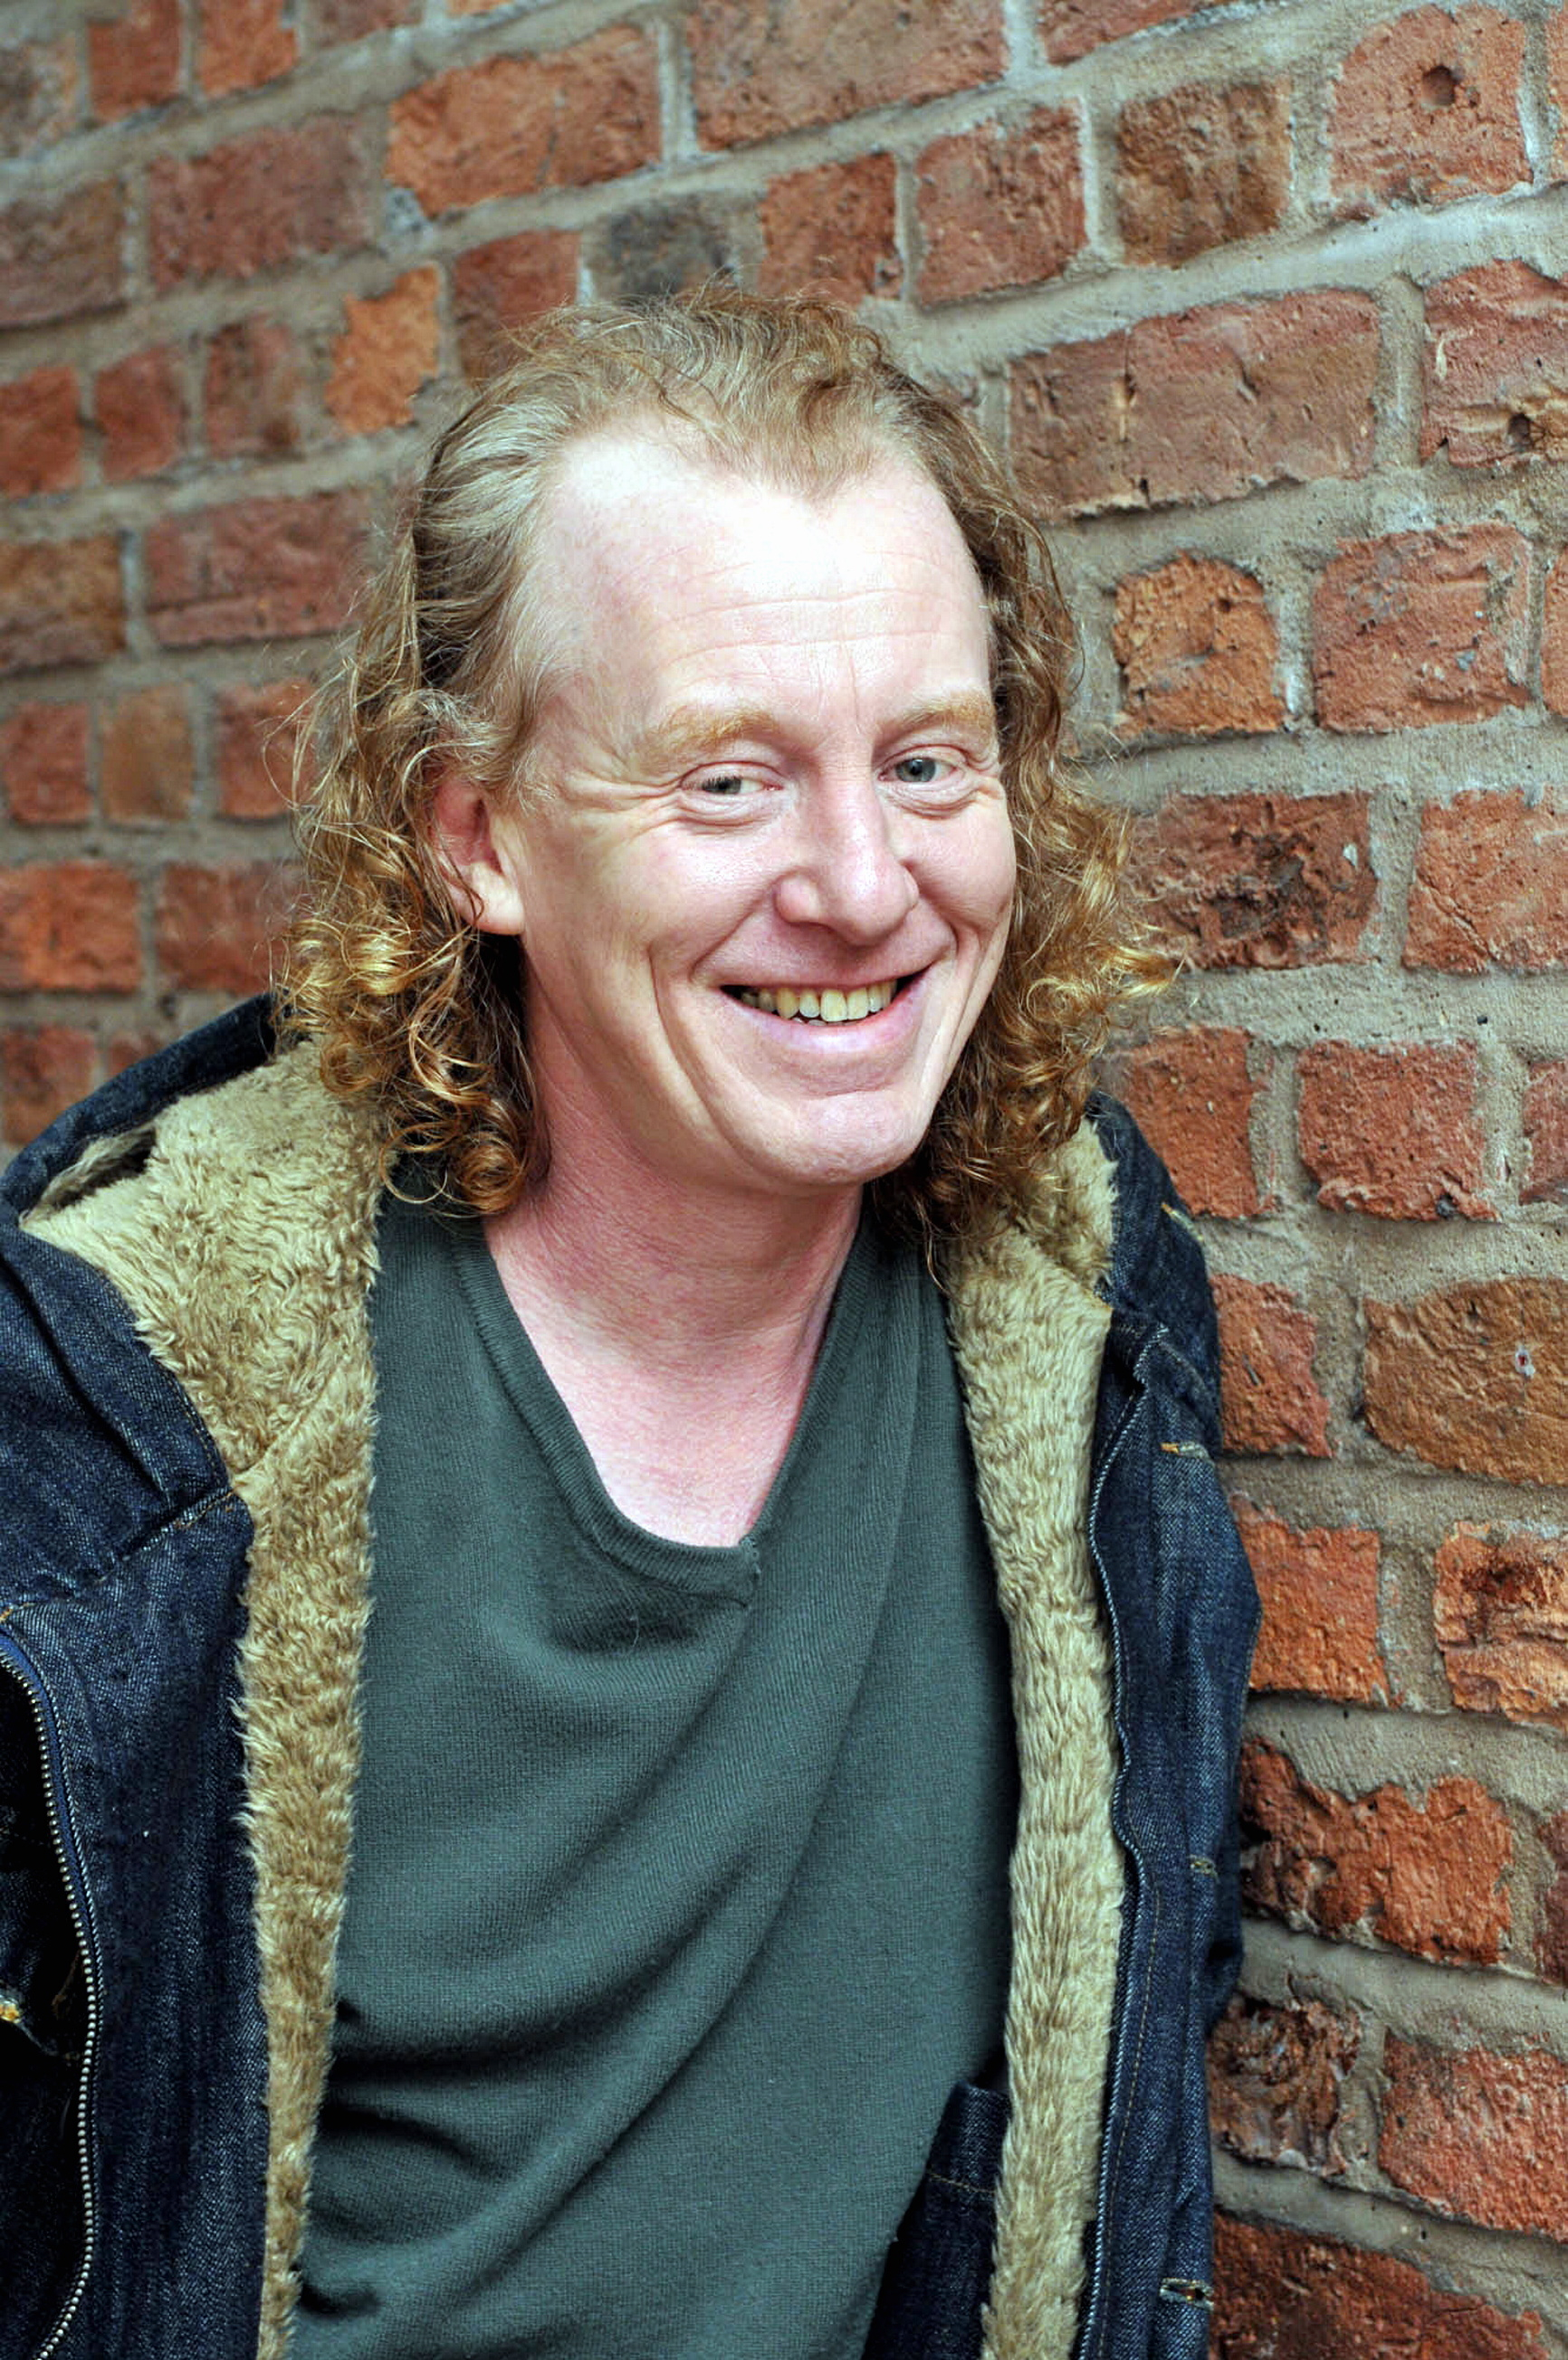 Steve Huison (born 1962)